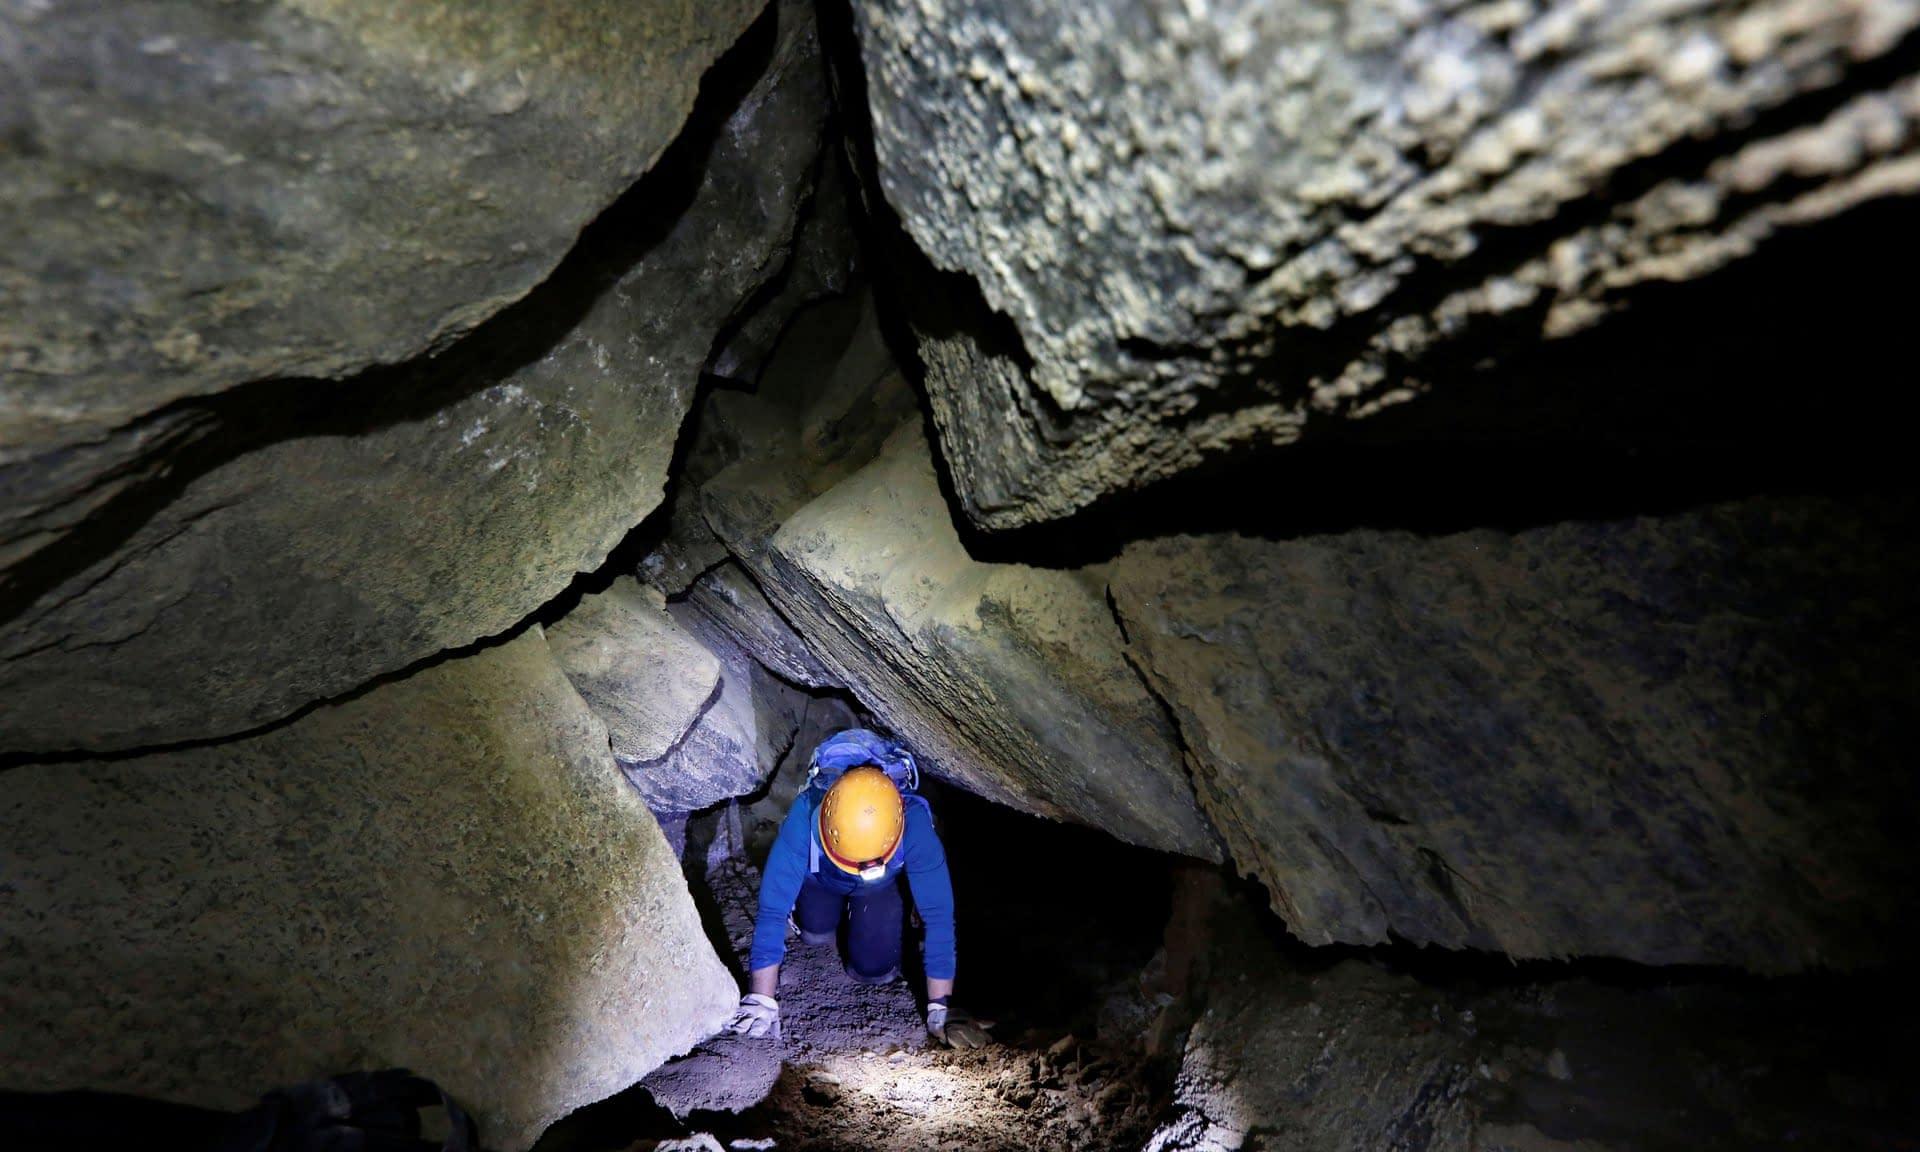 Malham Cave Salt cave 2 @paperslife